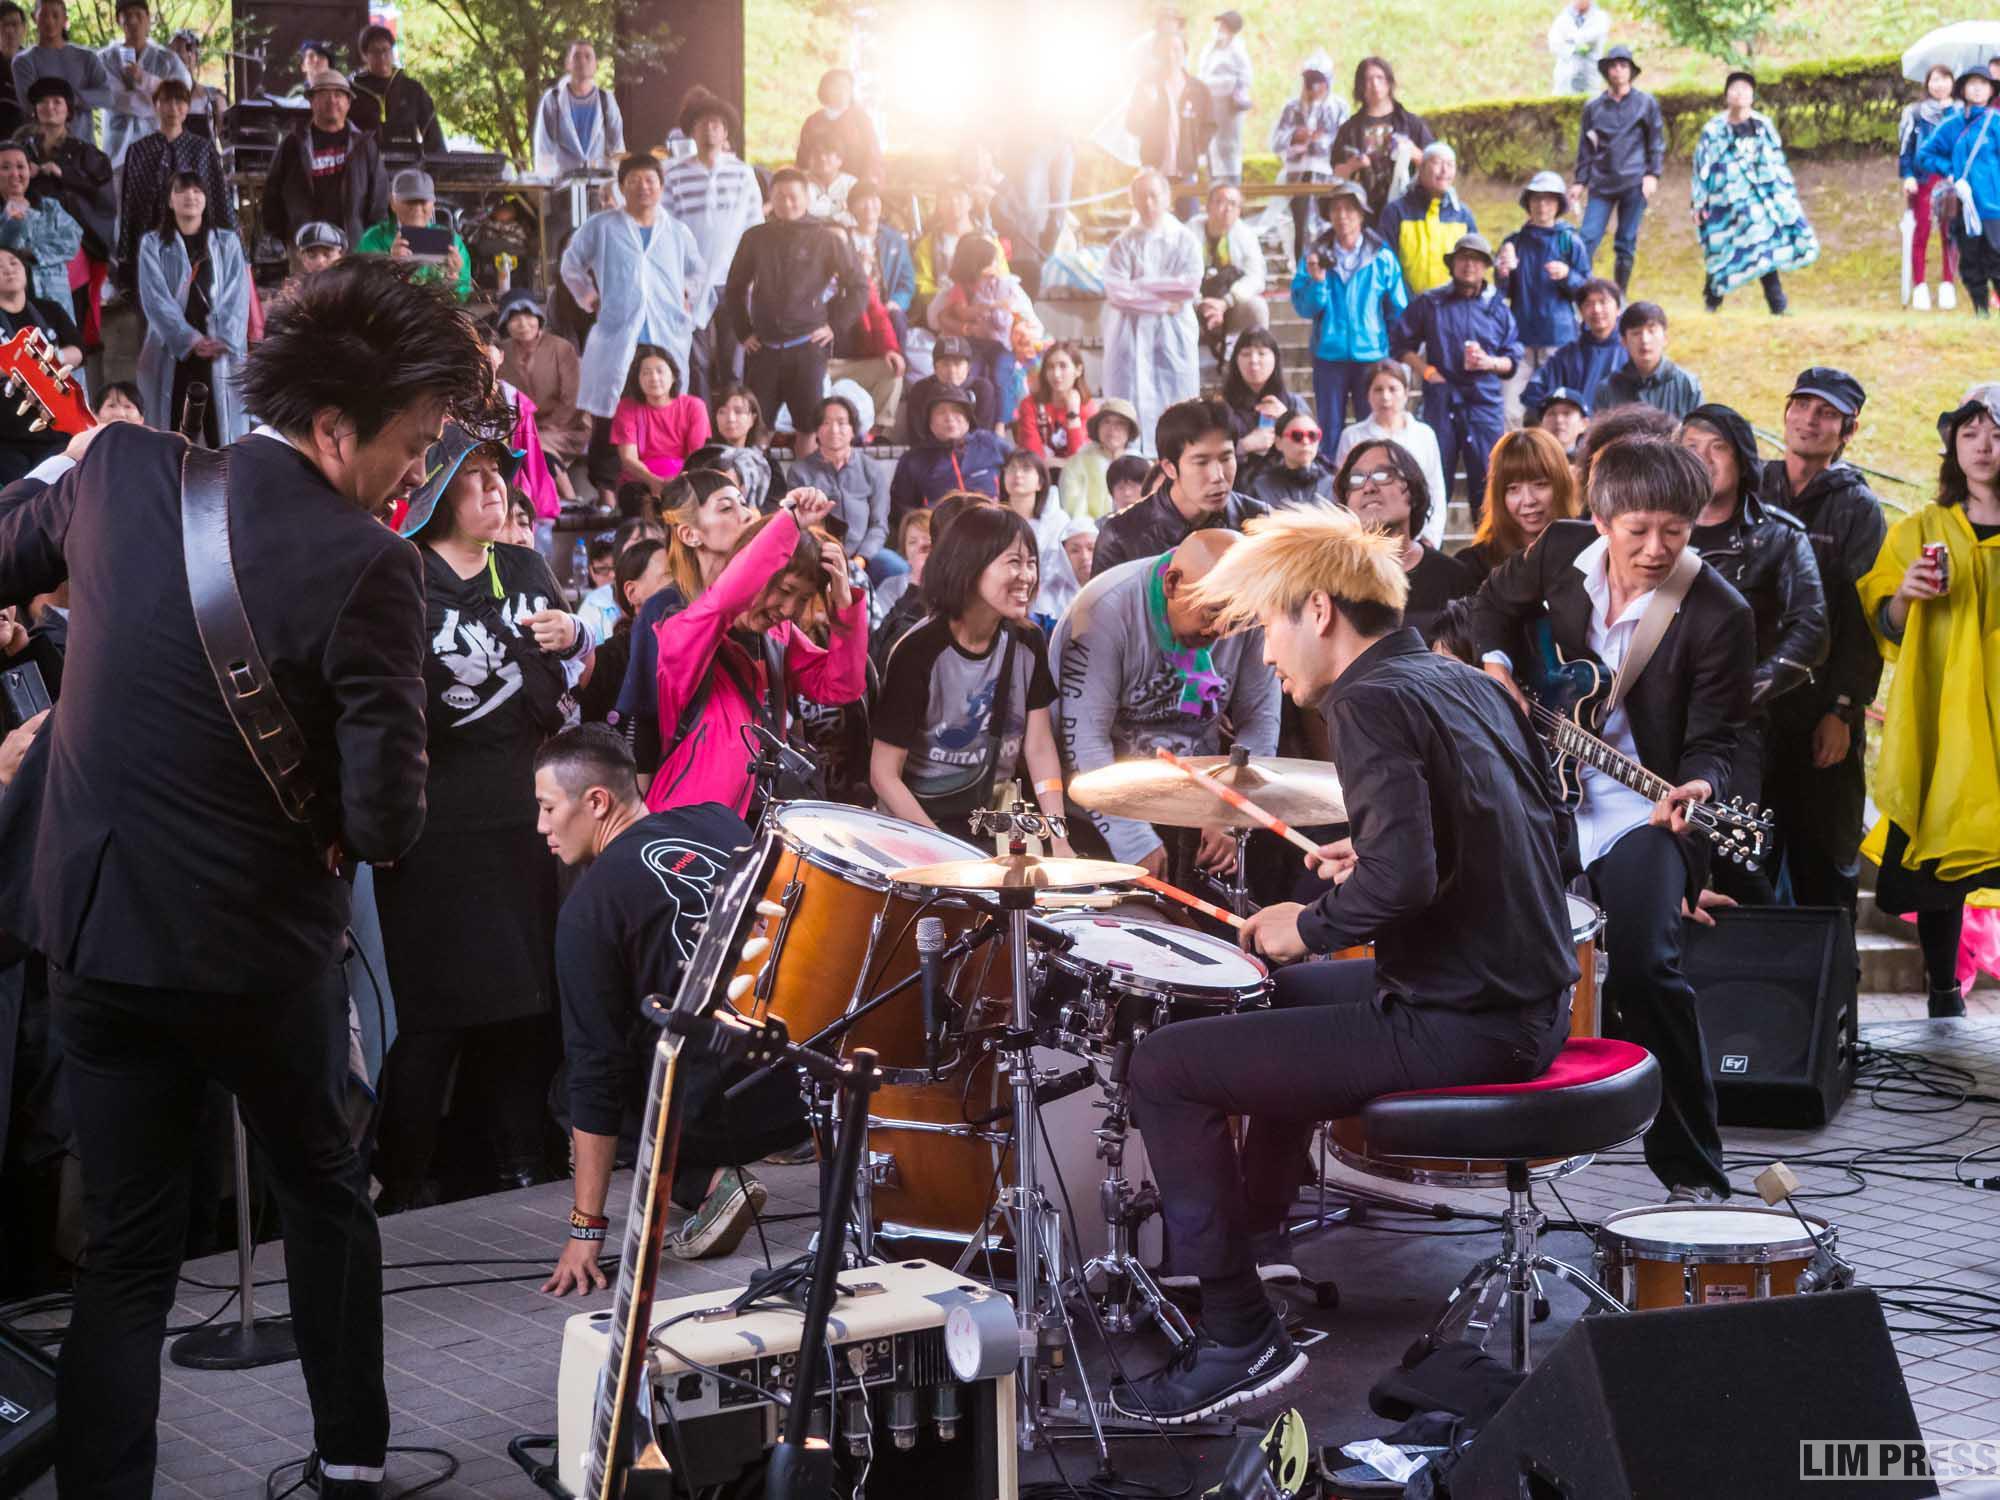 KING BROTHERS | シマネジェットフェス in 島根県松江市古墳の丘古曽志公園  | 2019.09.21